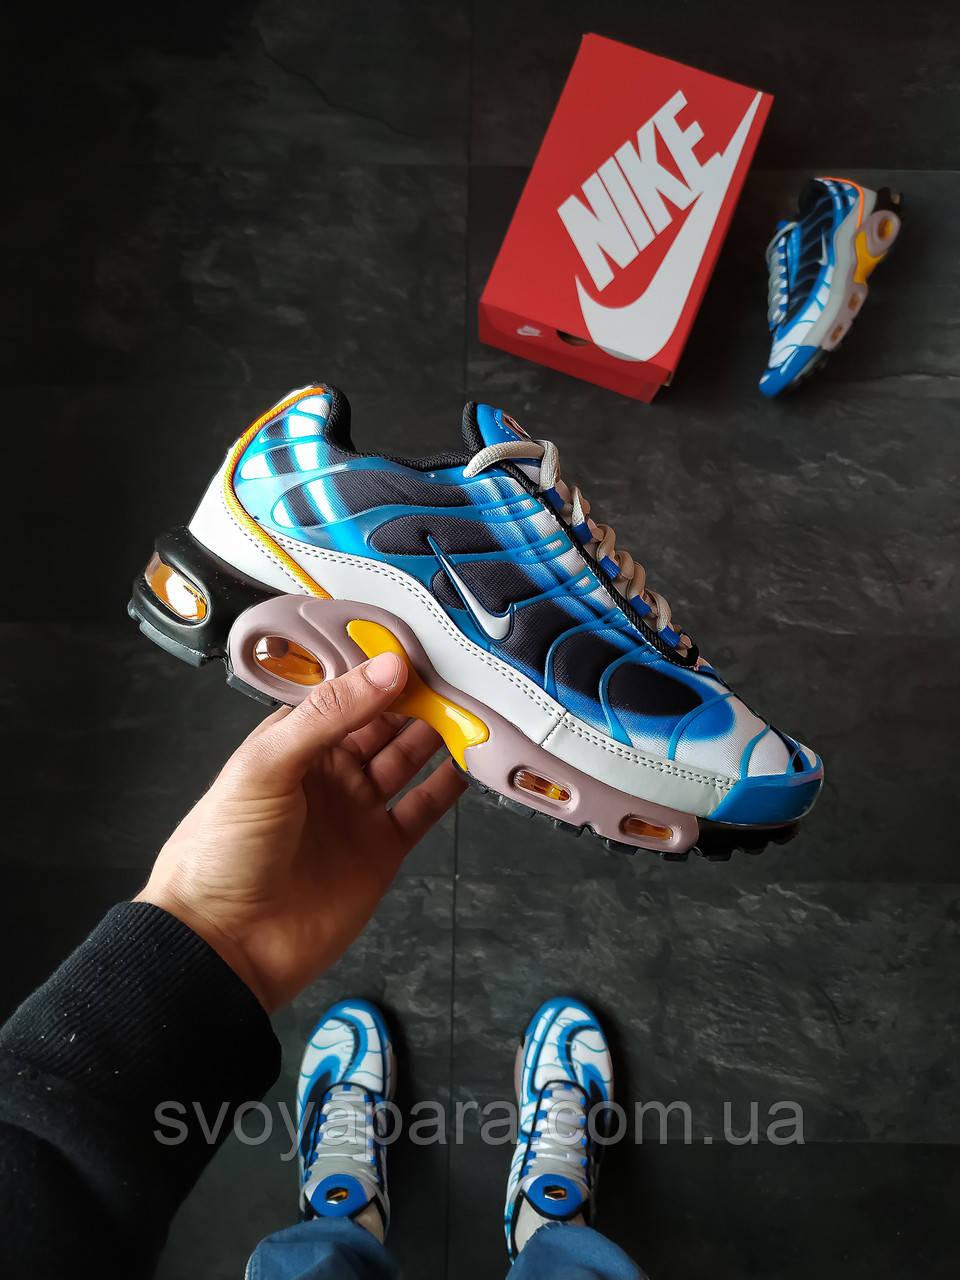 Мужские кроссовки Nike Air Max Plus TN 42 размер